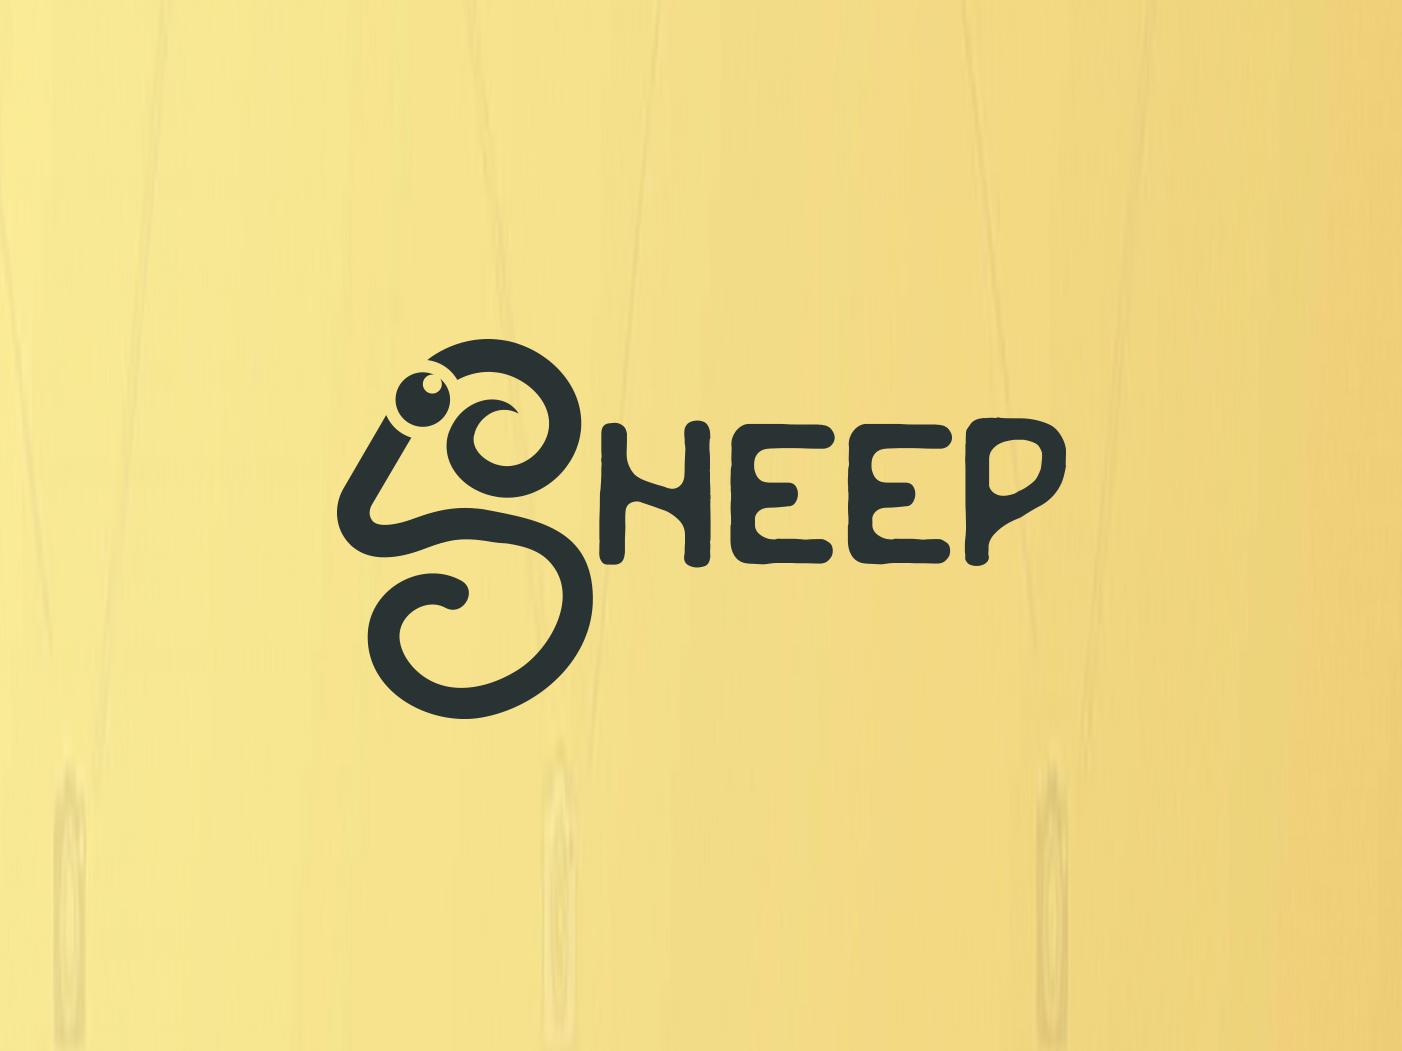 Sheep Logo ! simple sheep simple logo creative logo creative sheep logo creative sheep sheep logo sheep